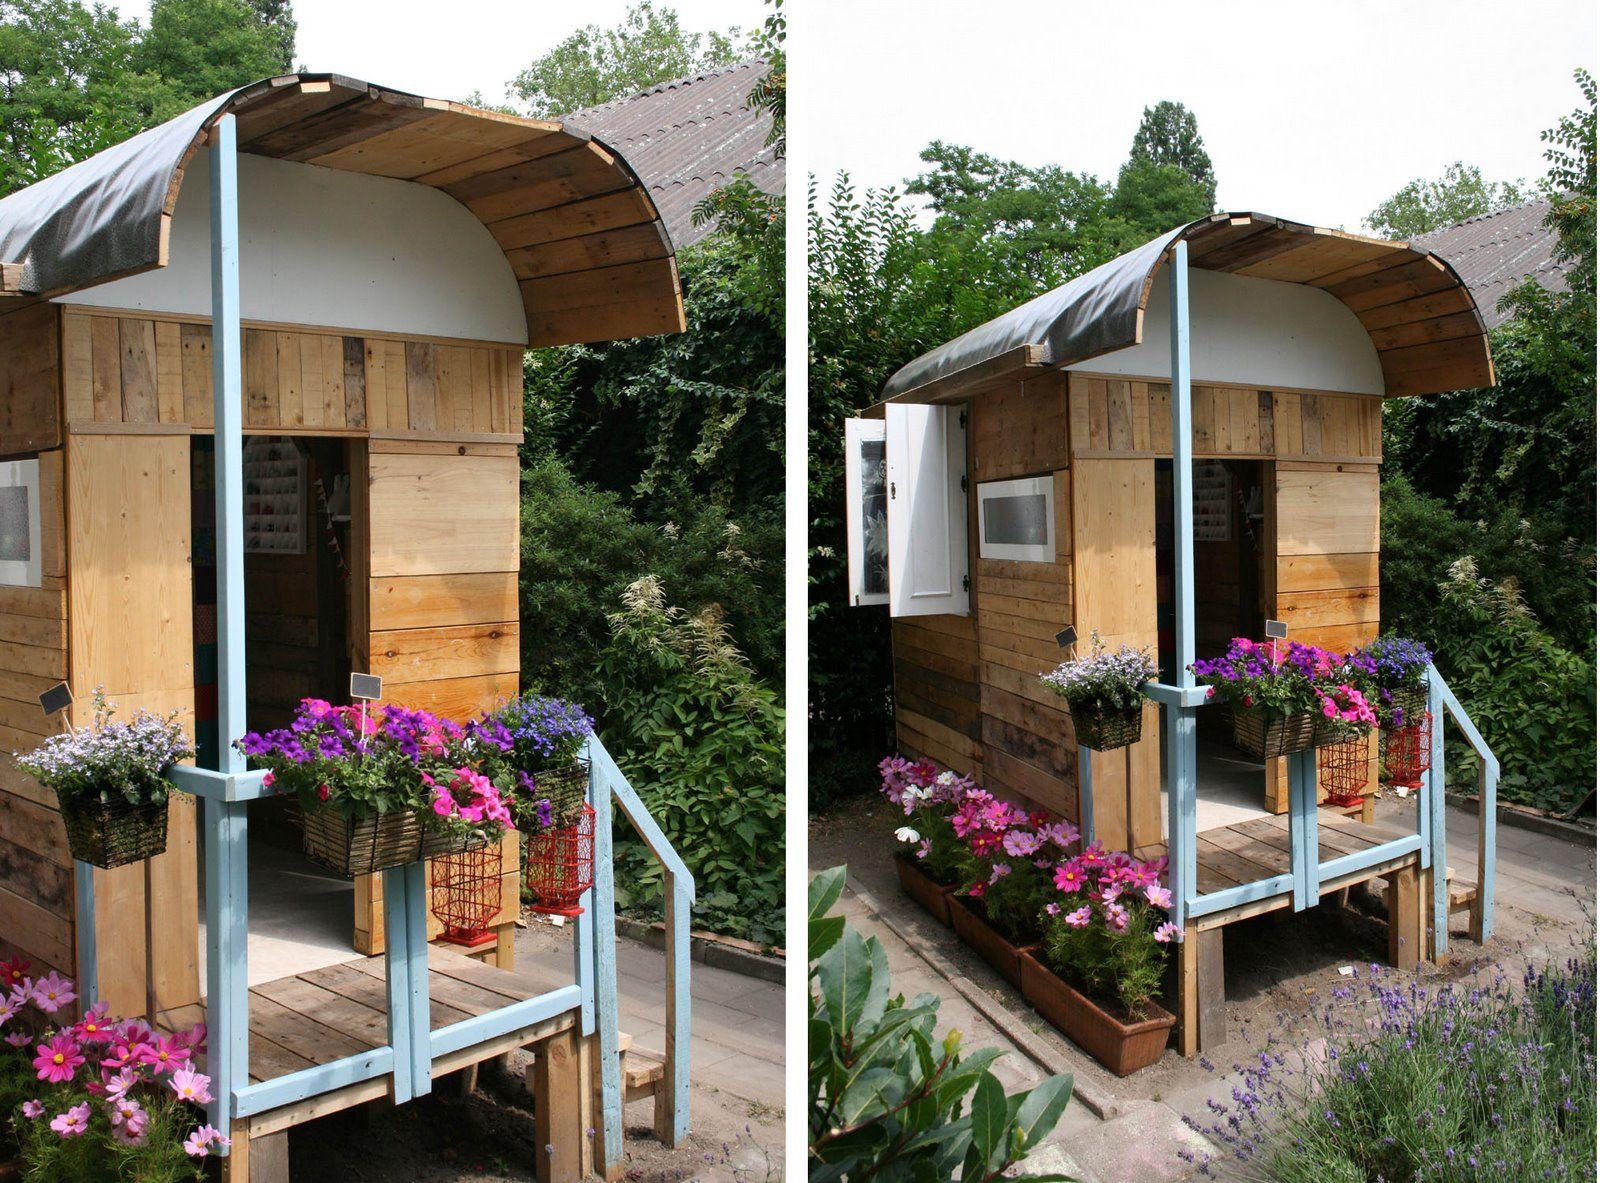 Interior, Captivating Crazy Home Designs Ideas: Caravan House Design, Not A  Crazy Idea Smart Home Design And Idea